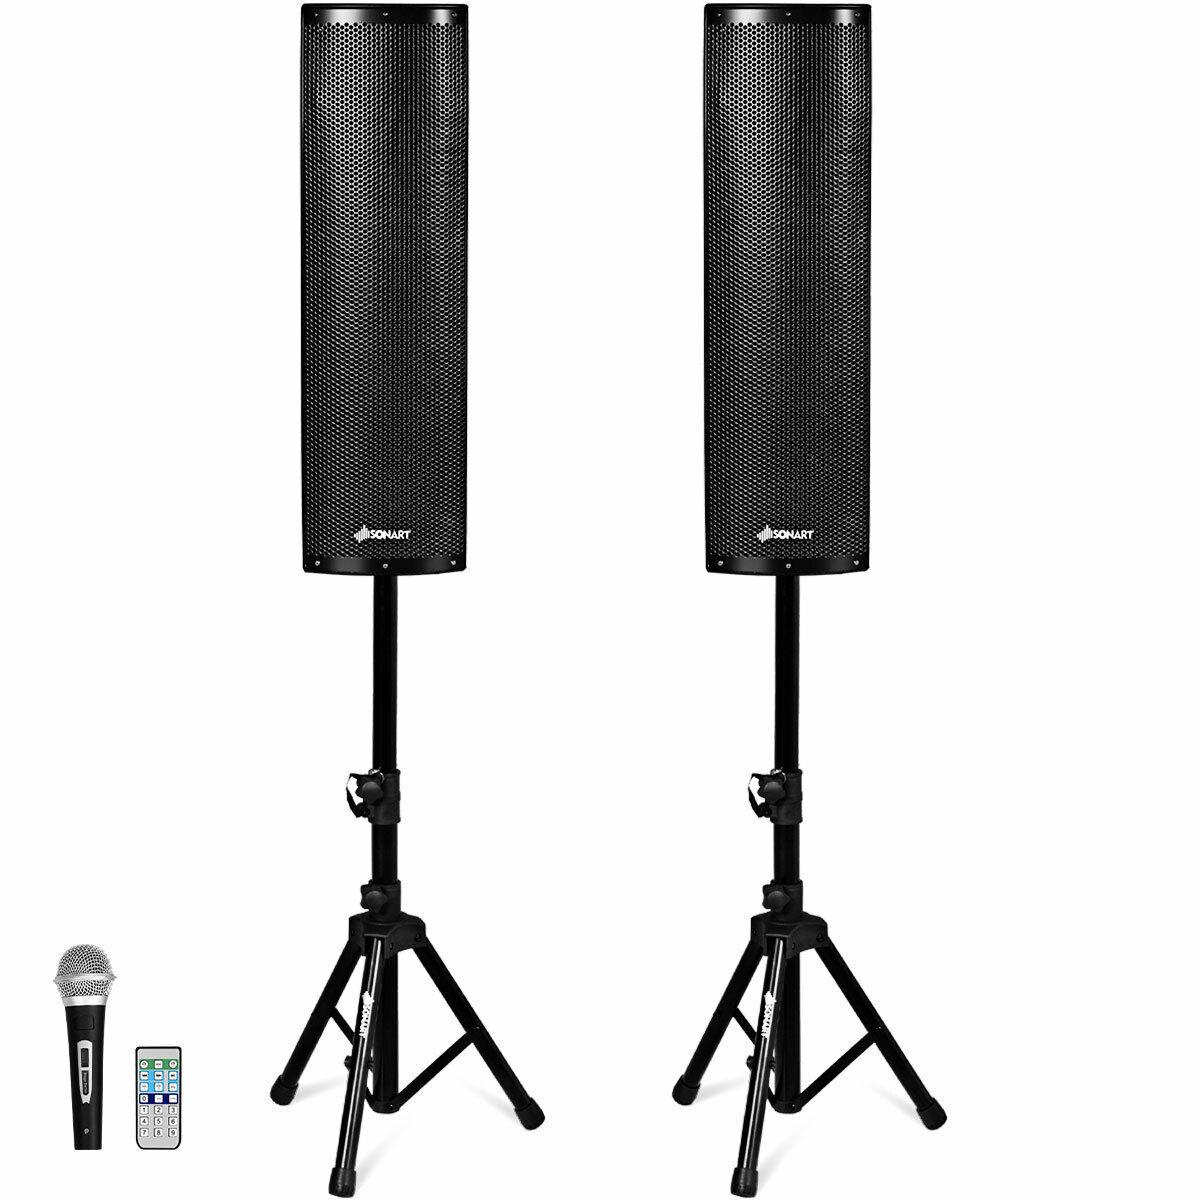 Costway 2000W Set of 2 Bi-Amplified Bluetooth Speakers